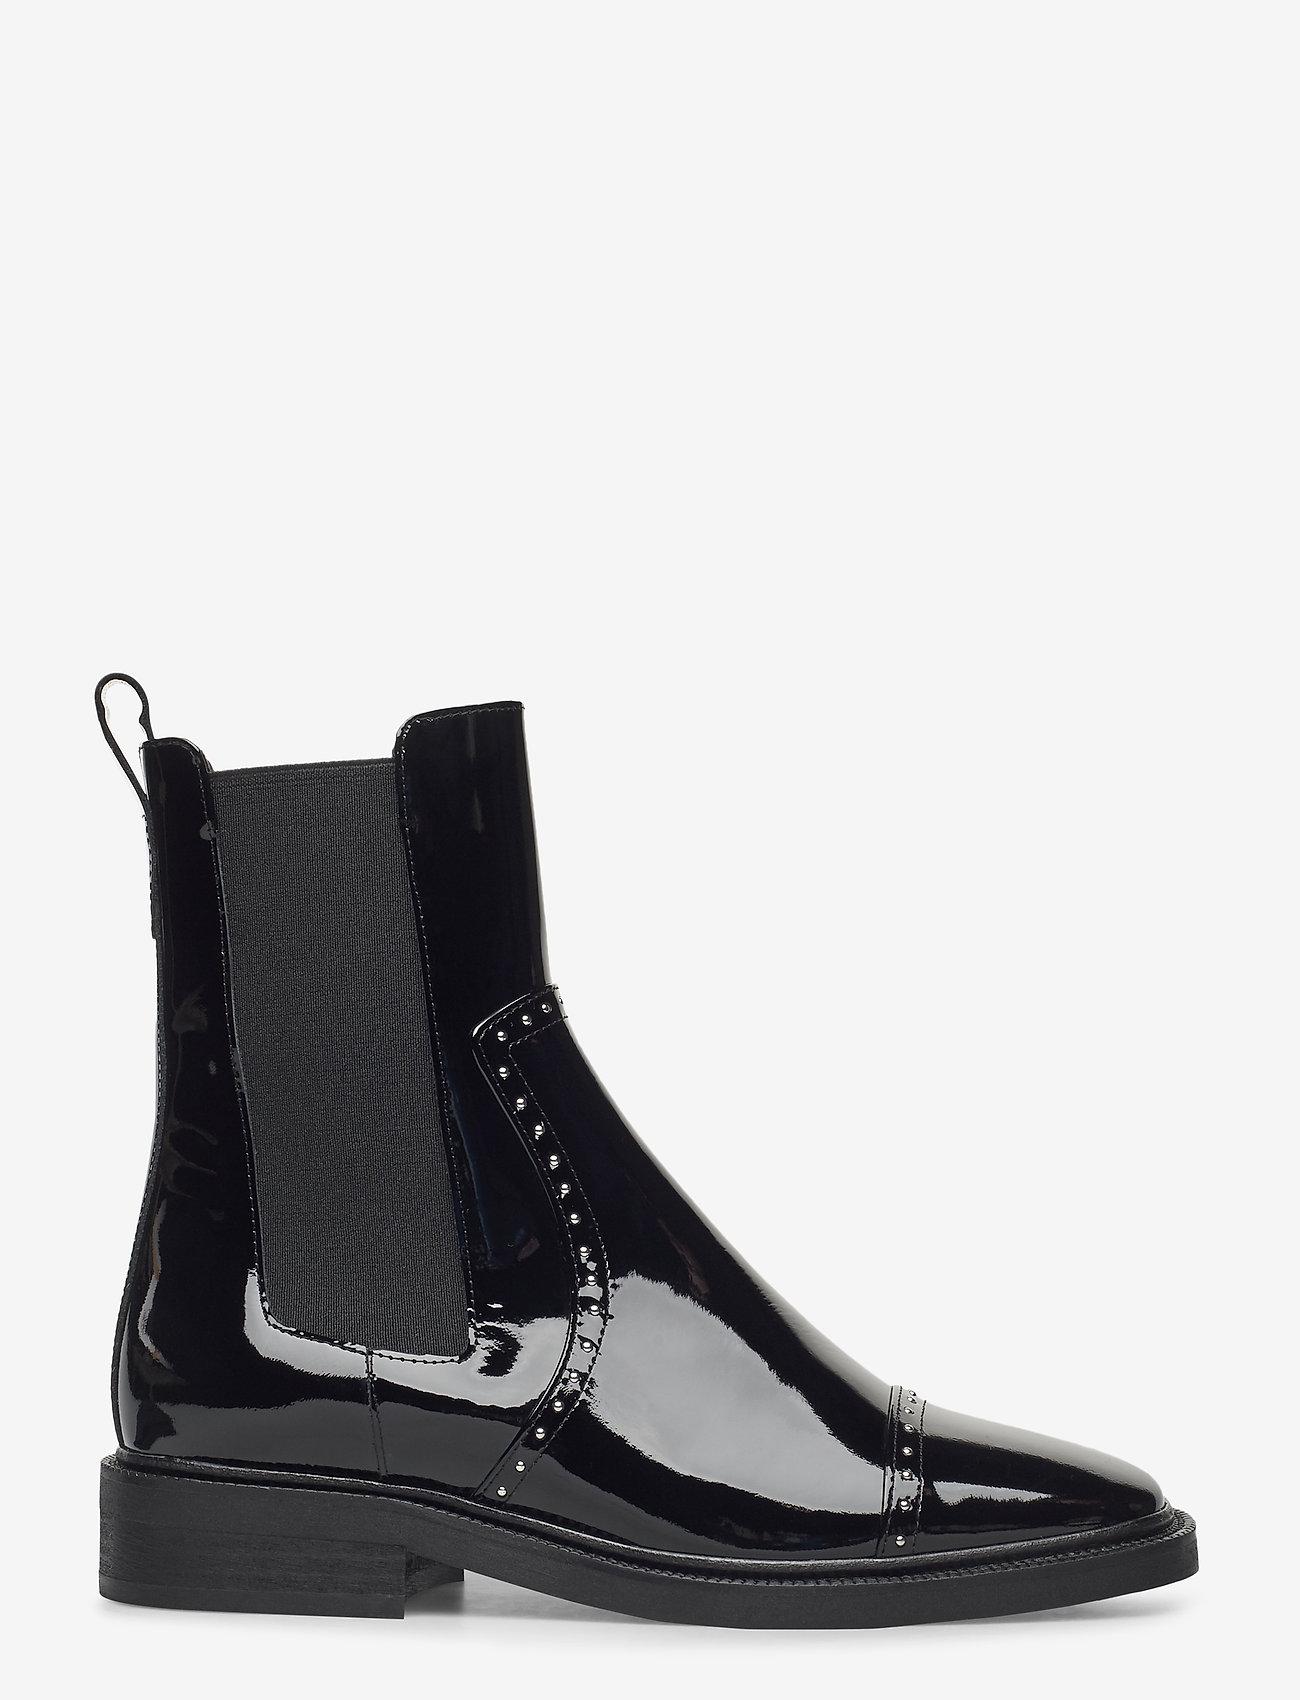 Billi Bi - Boots 4816 - chelsea boots - black patent 200 - 1